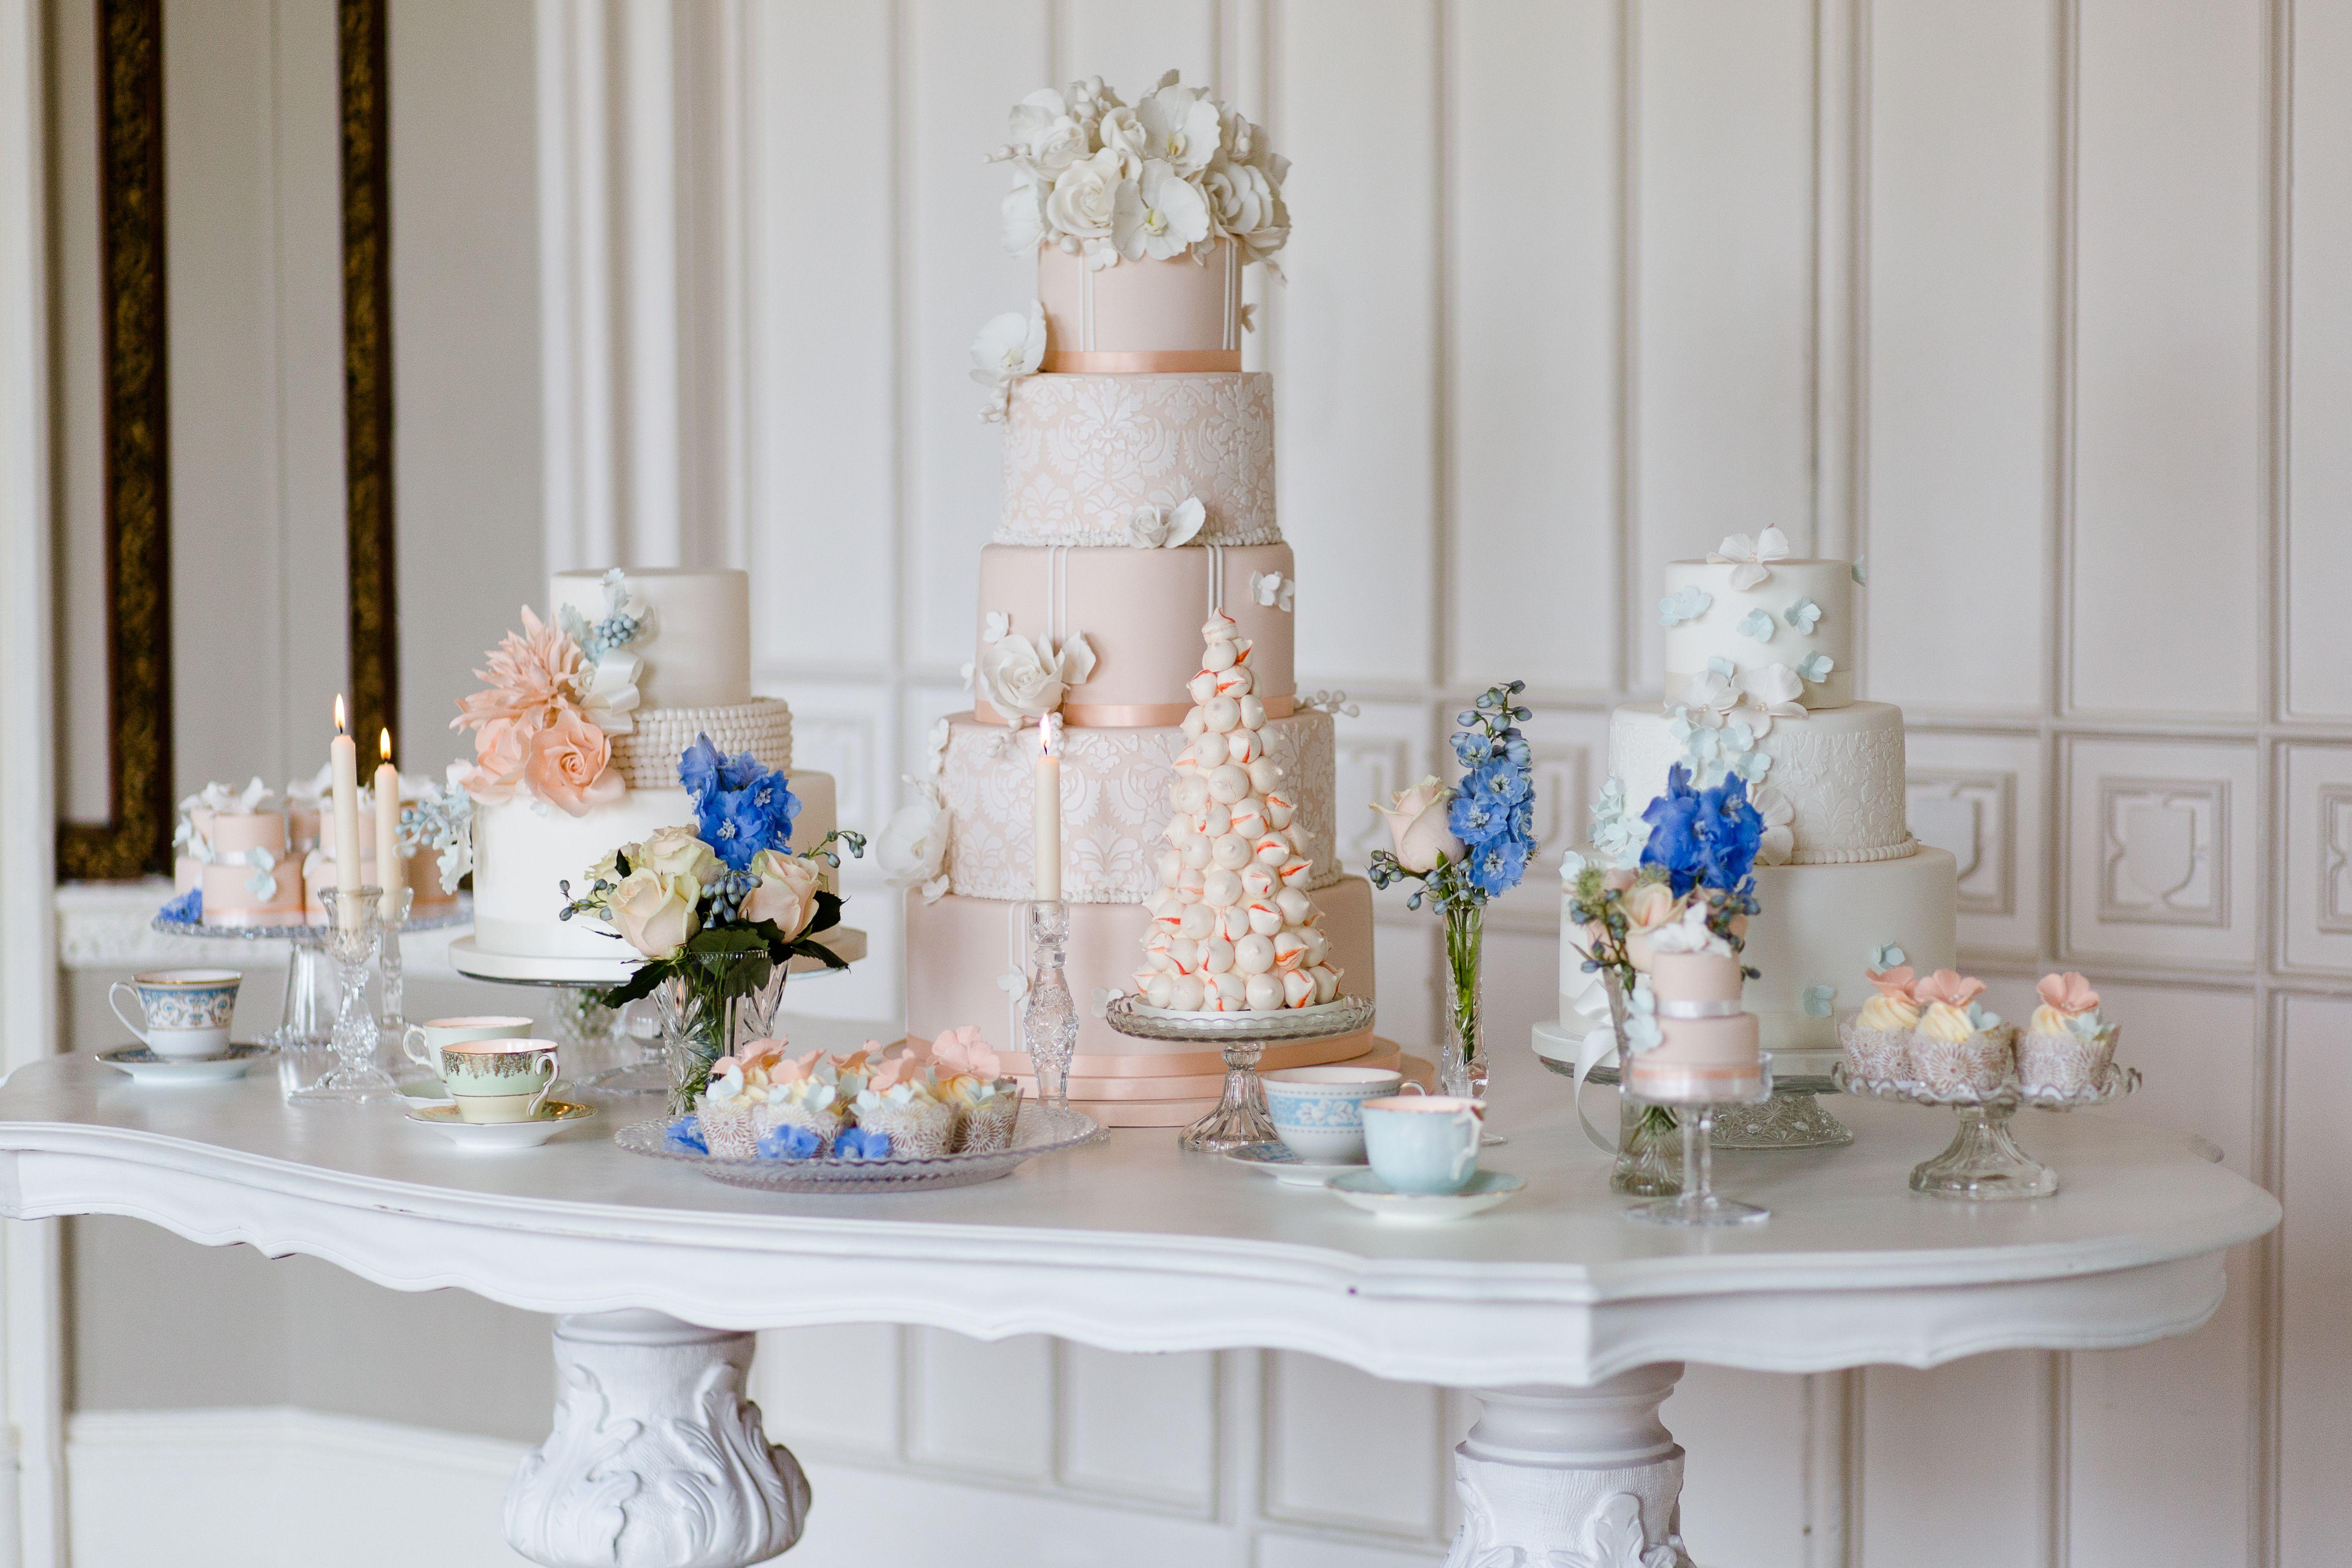 Classic dessert table by cakes by krishanthi image eddie judd